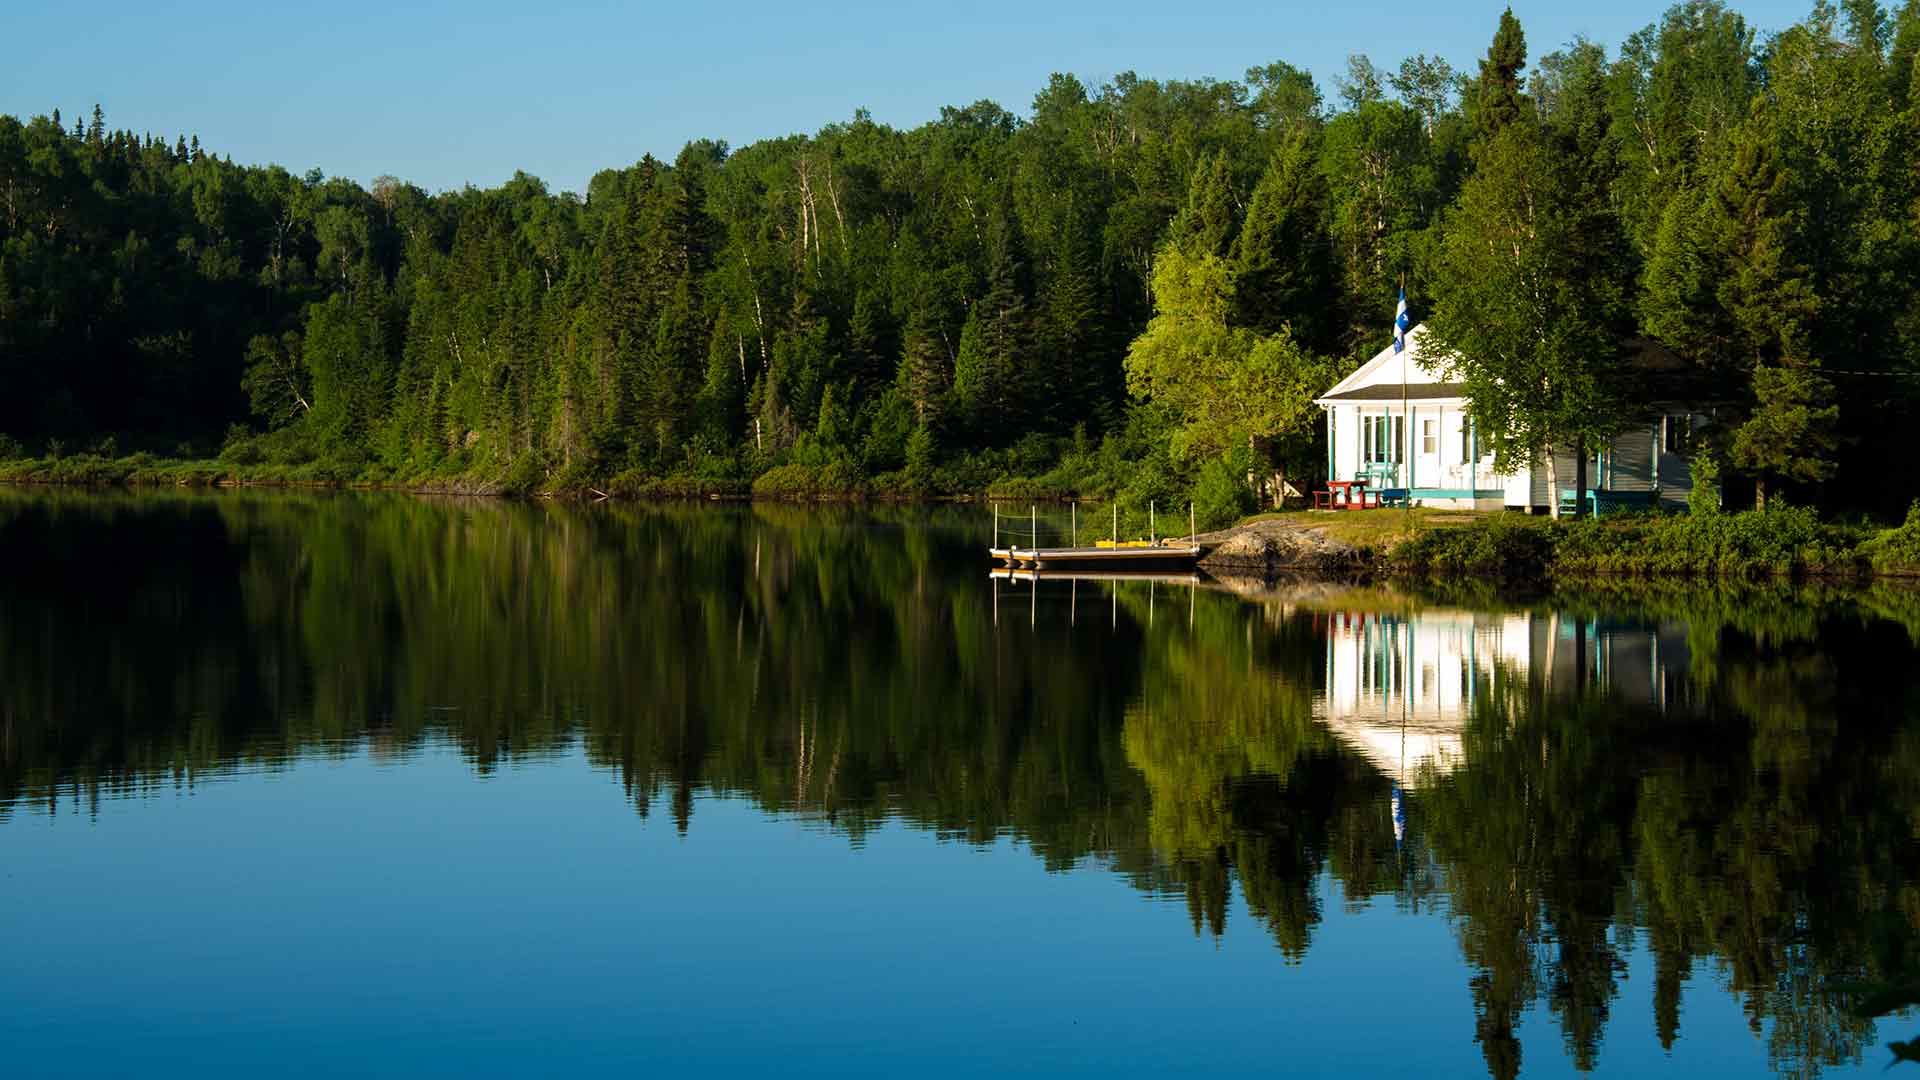 Rent cottage insurance Ontario